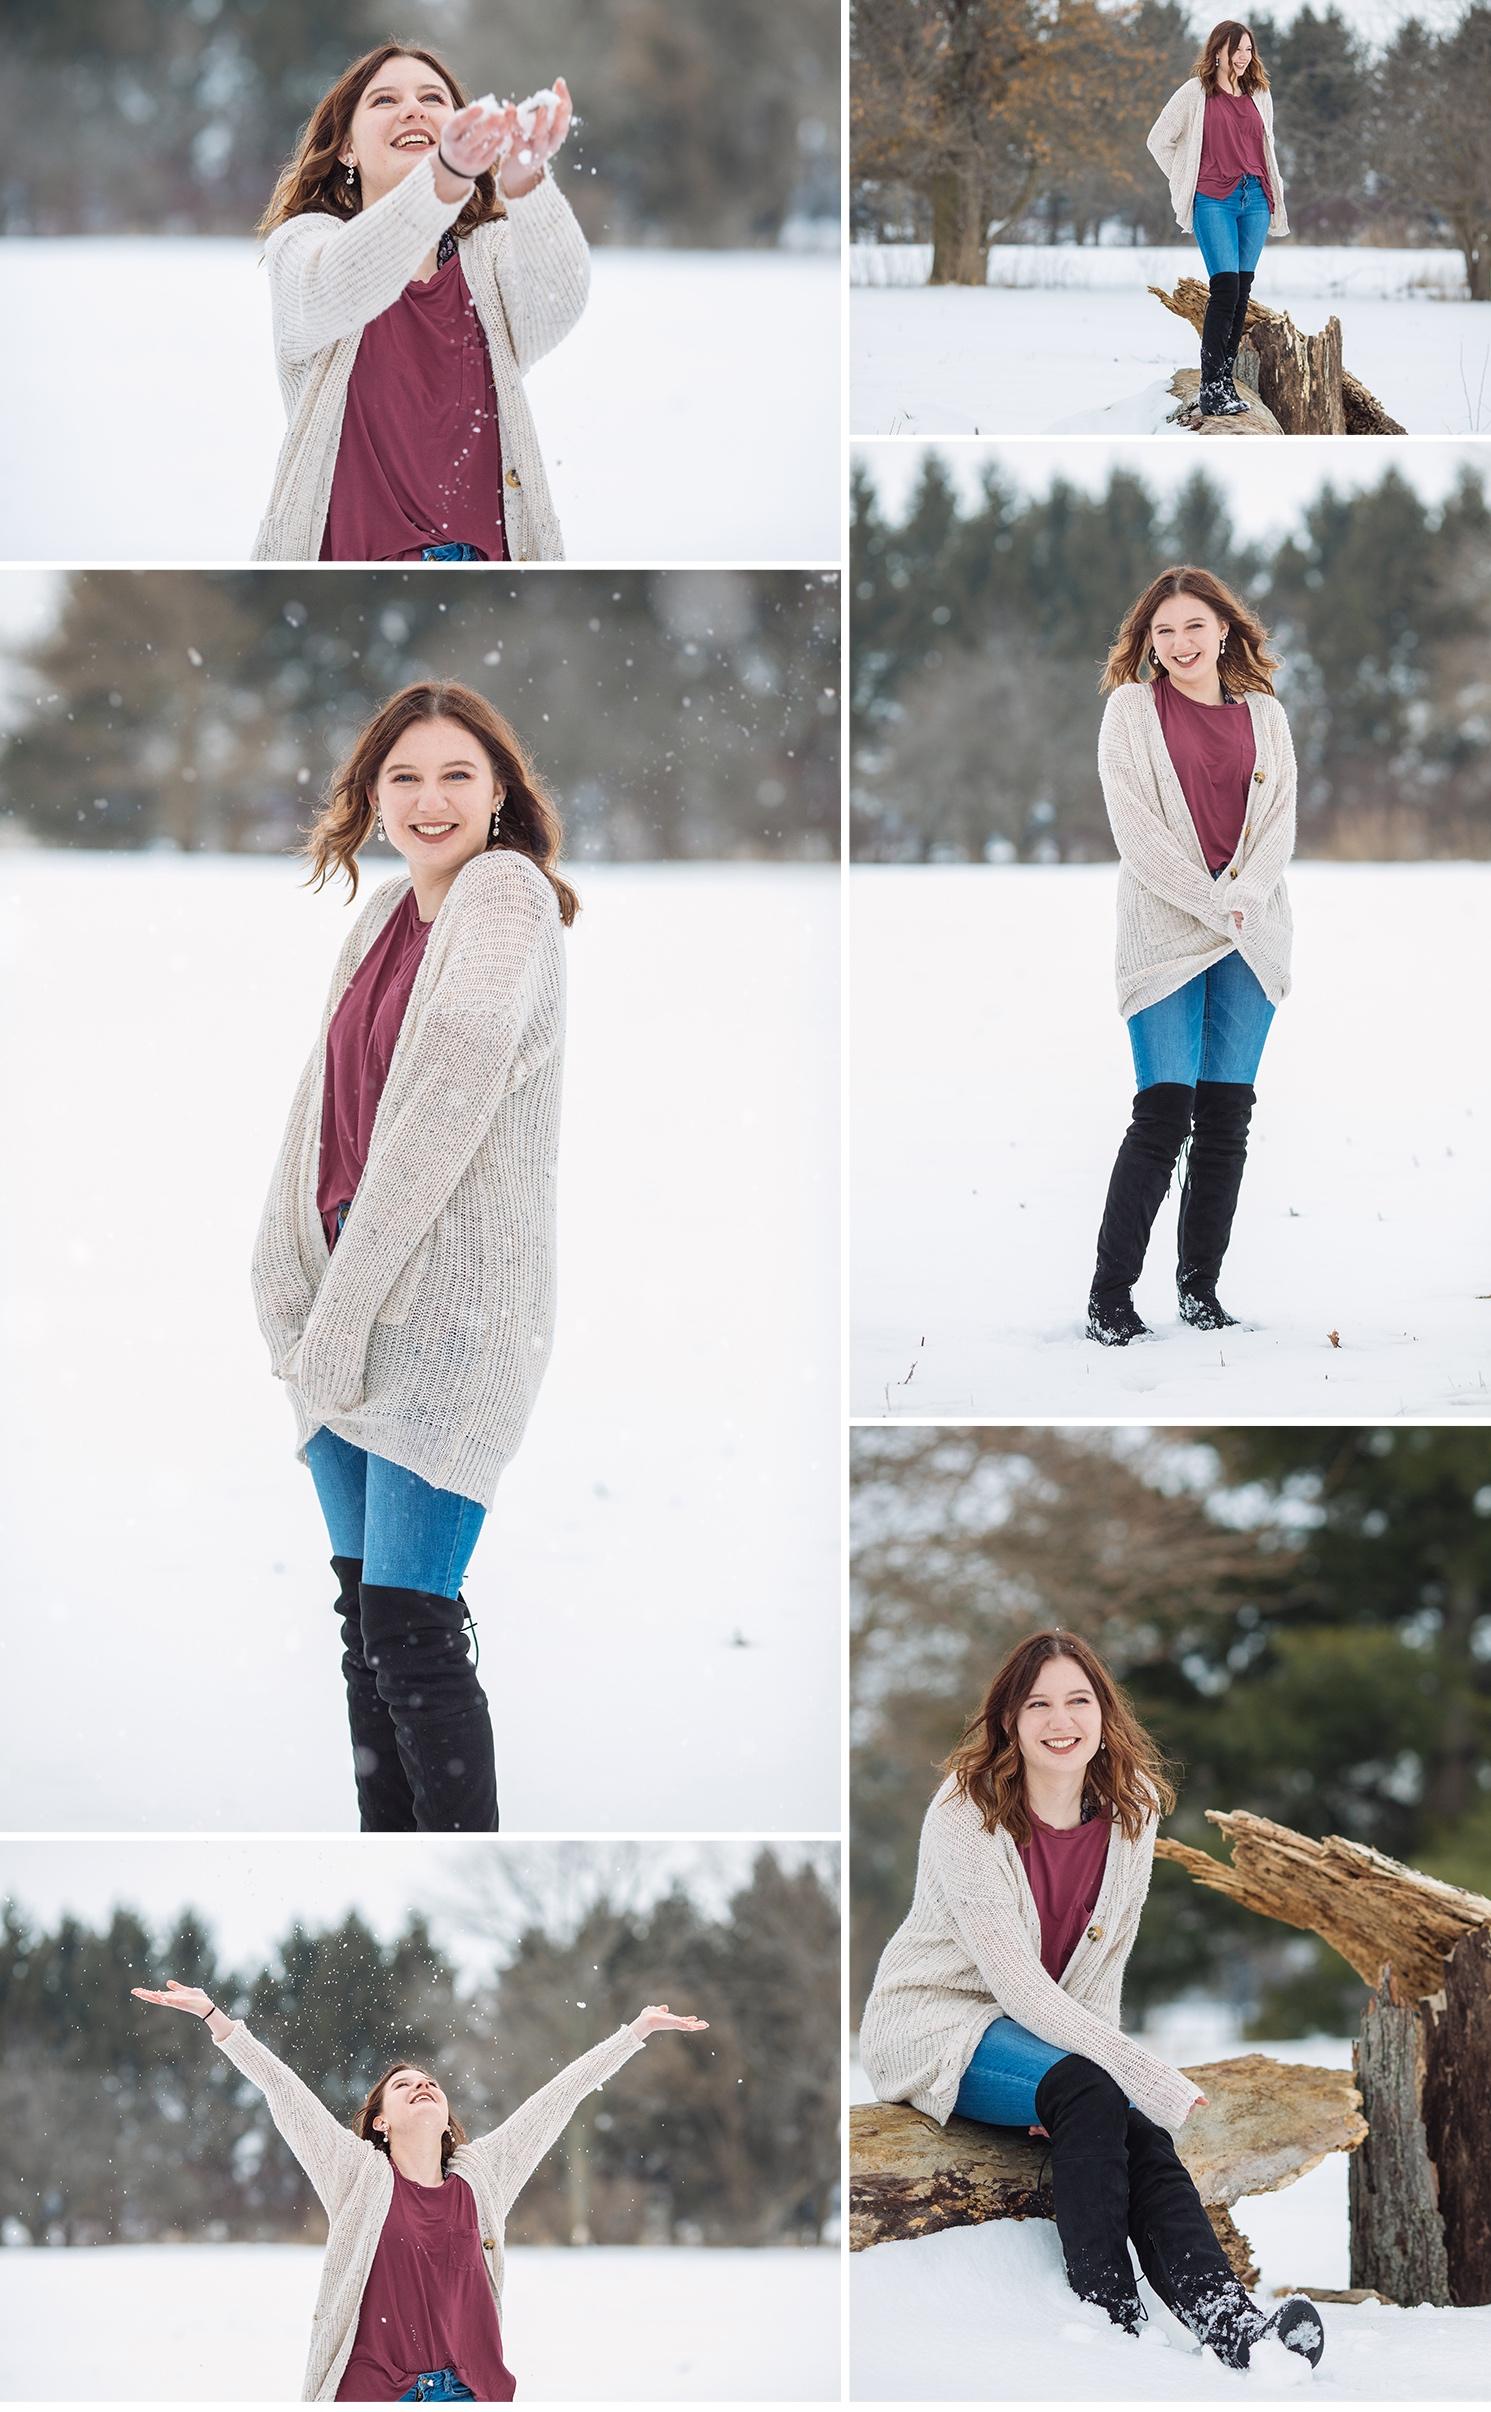 Kaitlyn-Elzeywinter.jpg